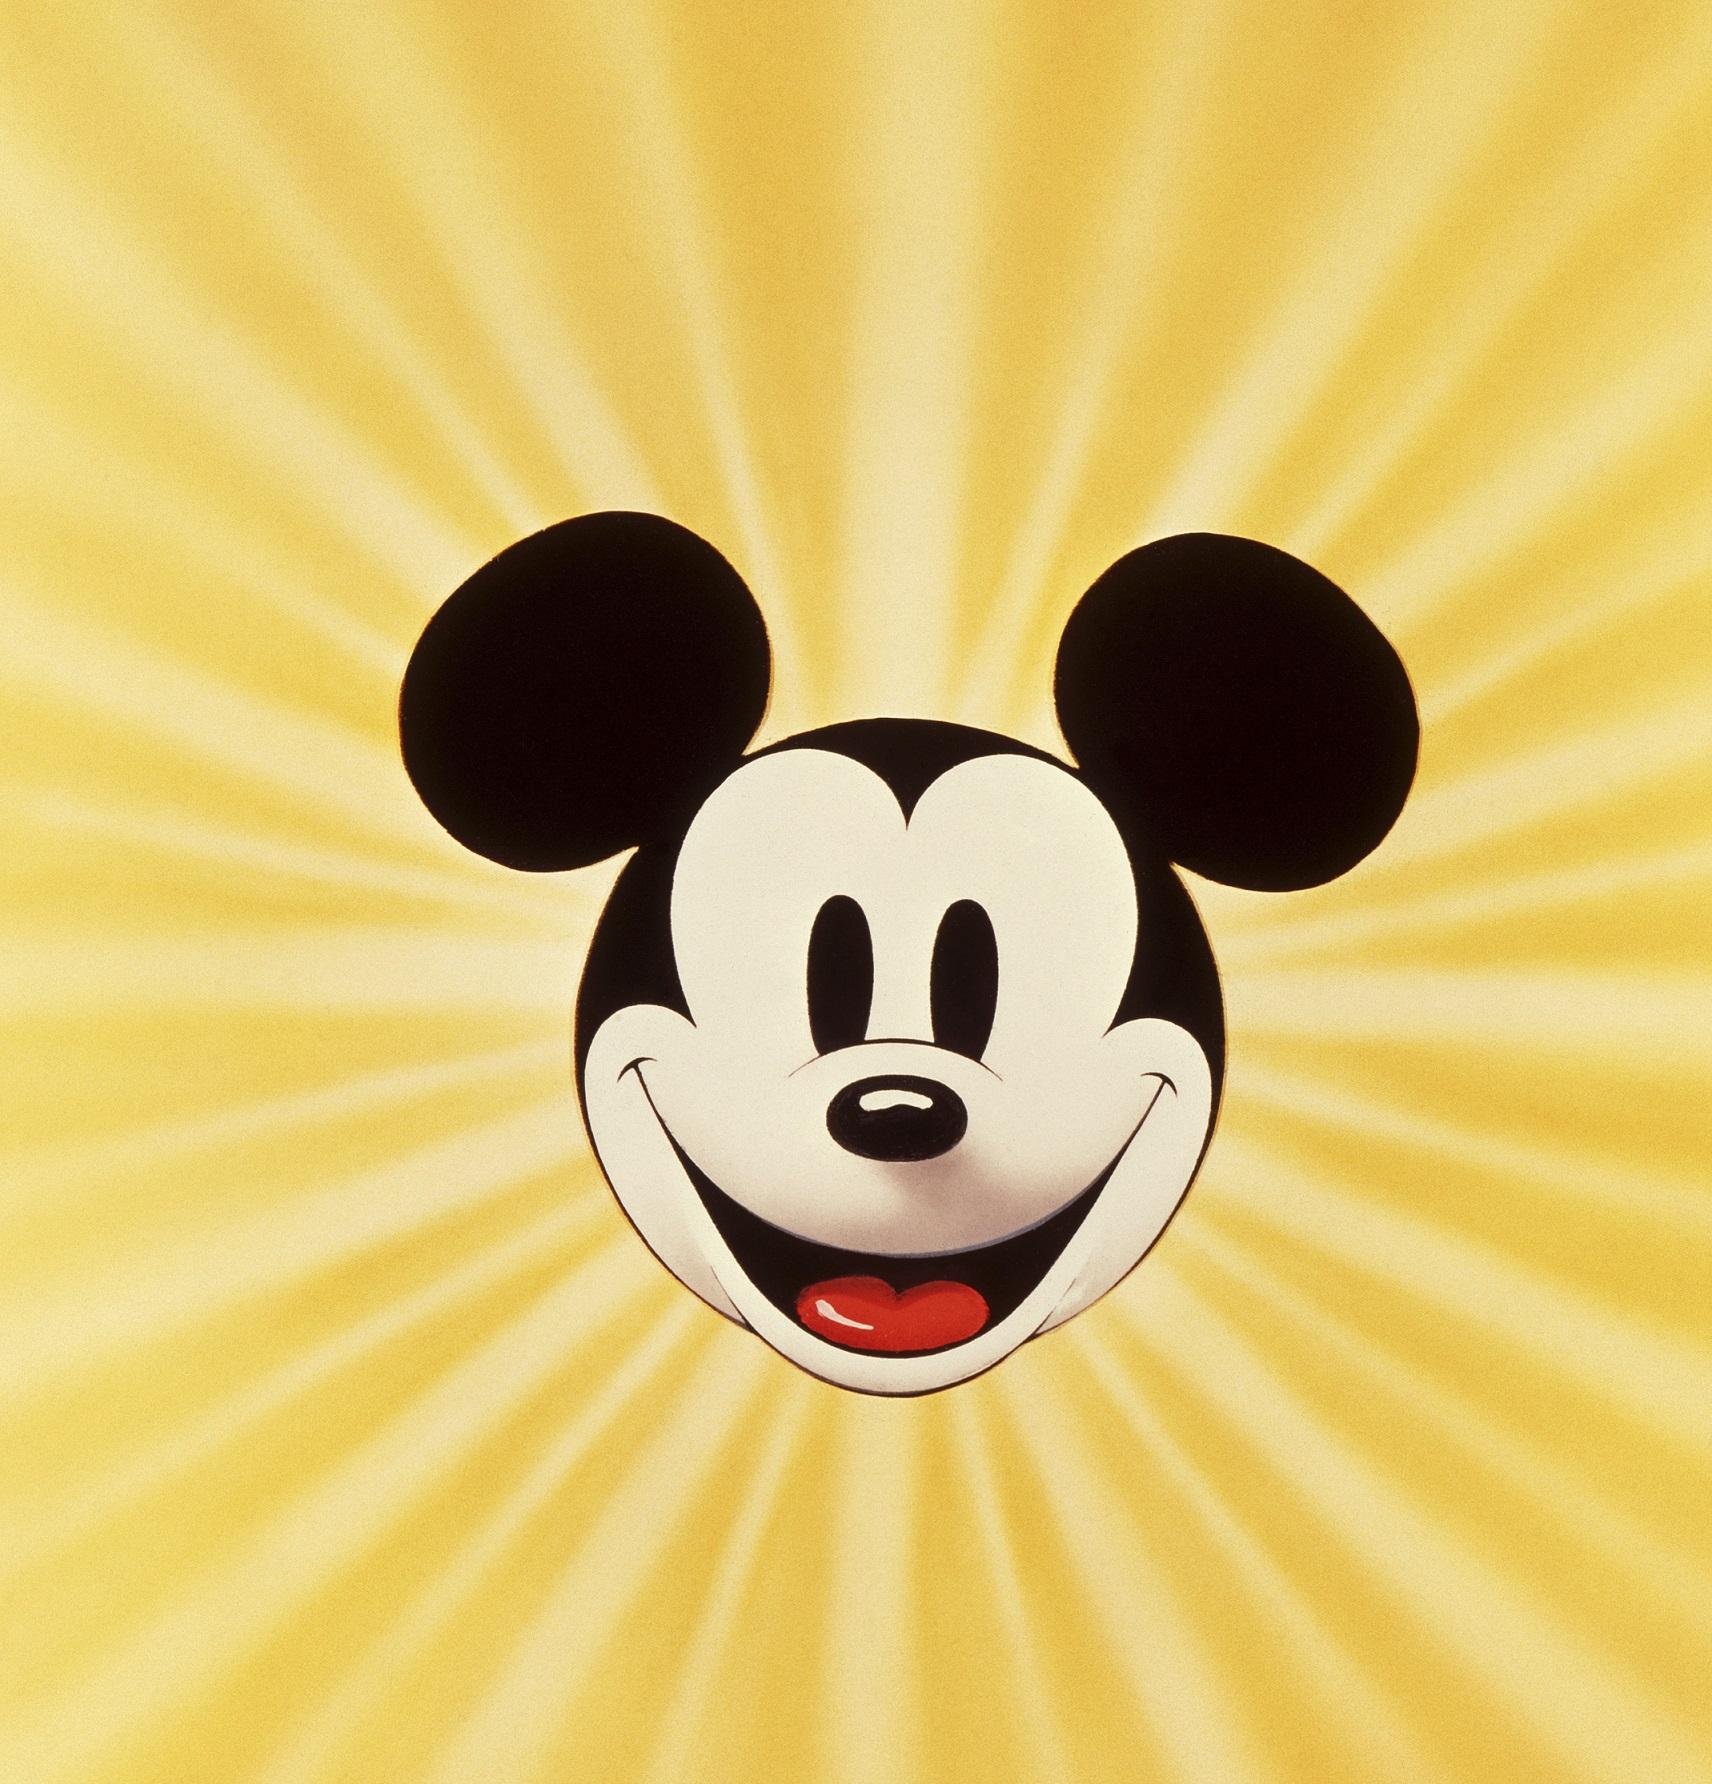 Mickey Mouse, 90 de ani de la aparitia sa